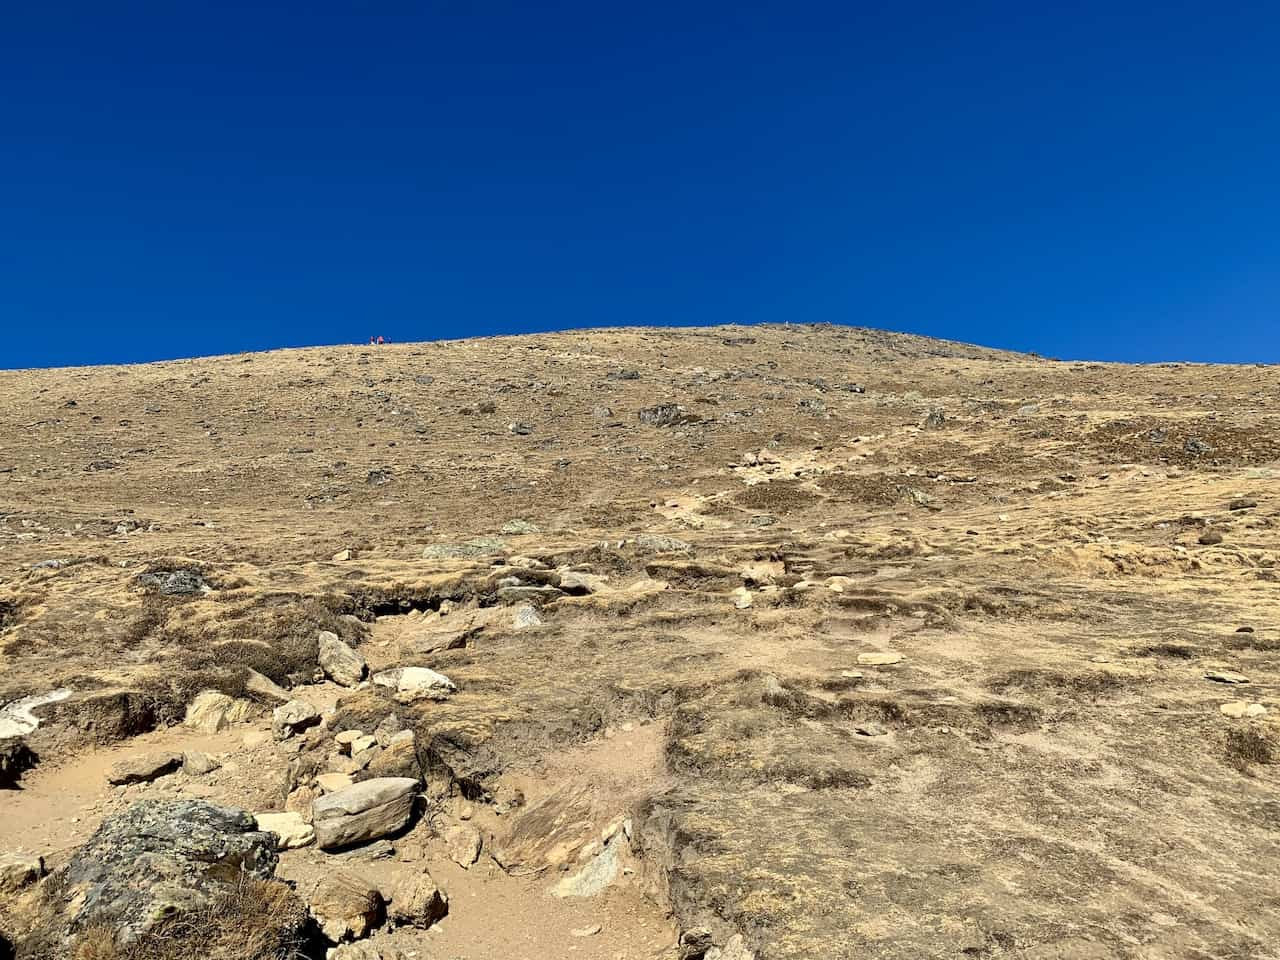 Himalayas Hiking Path